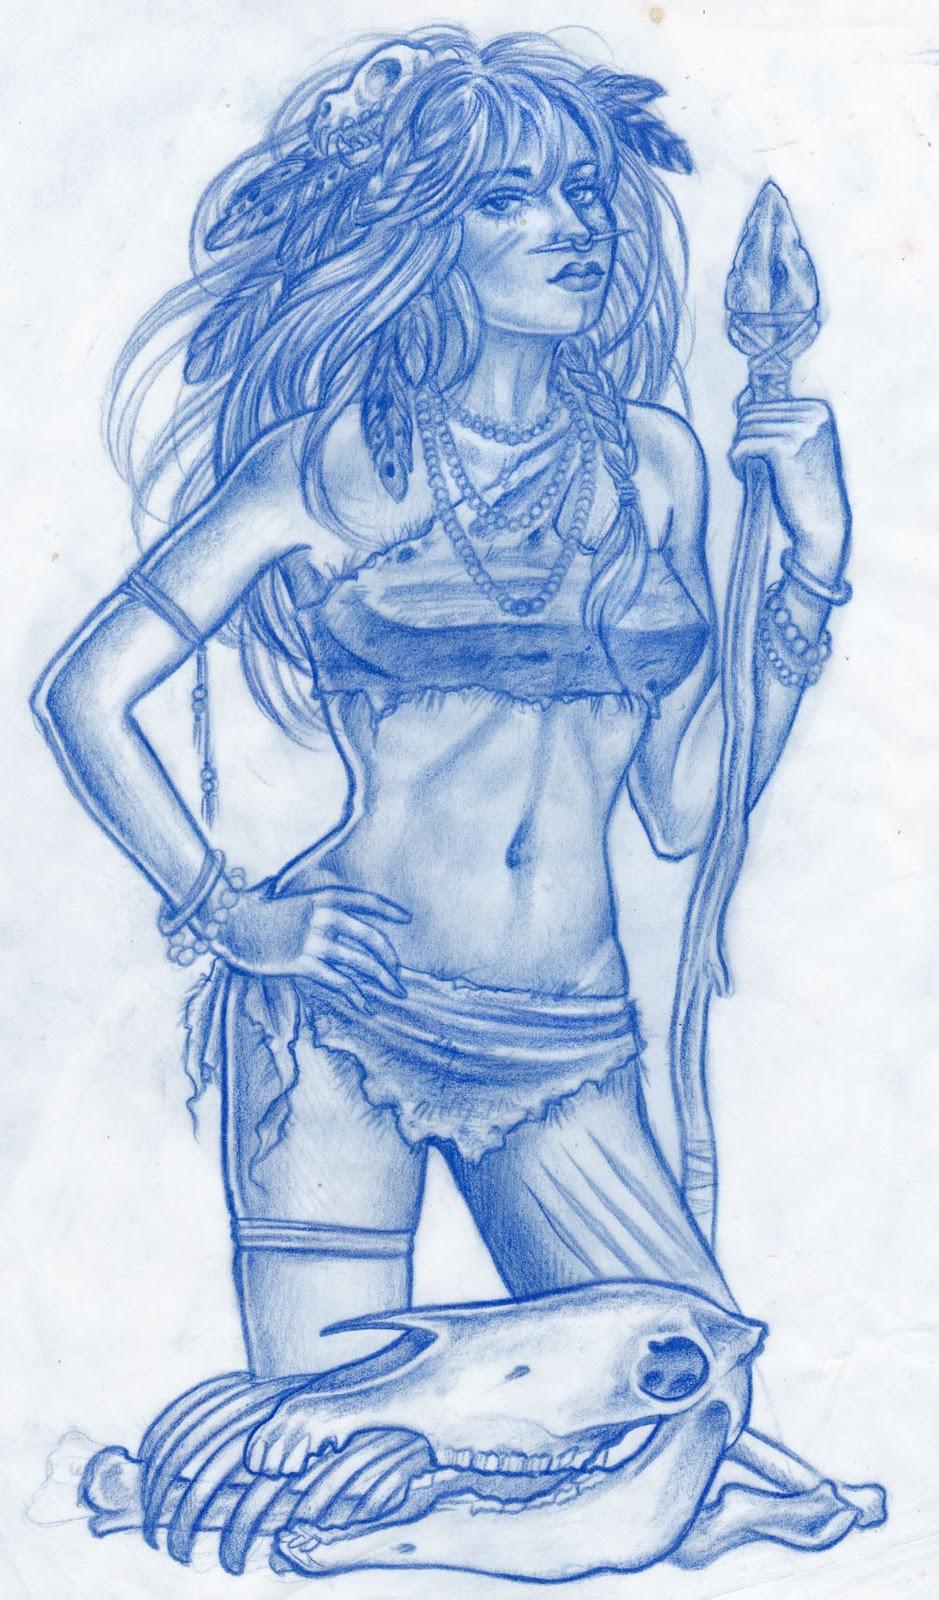 Ayla Clan Of The Cave Bear Art 35783 Usbdata